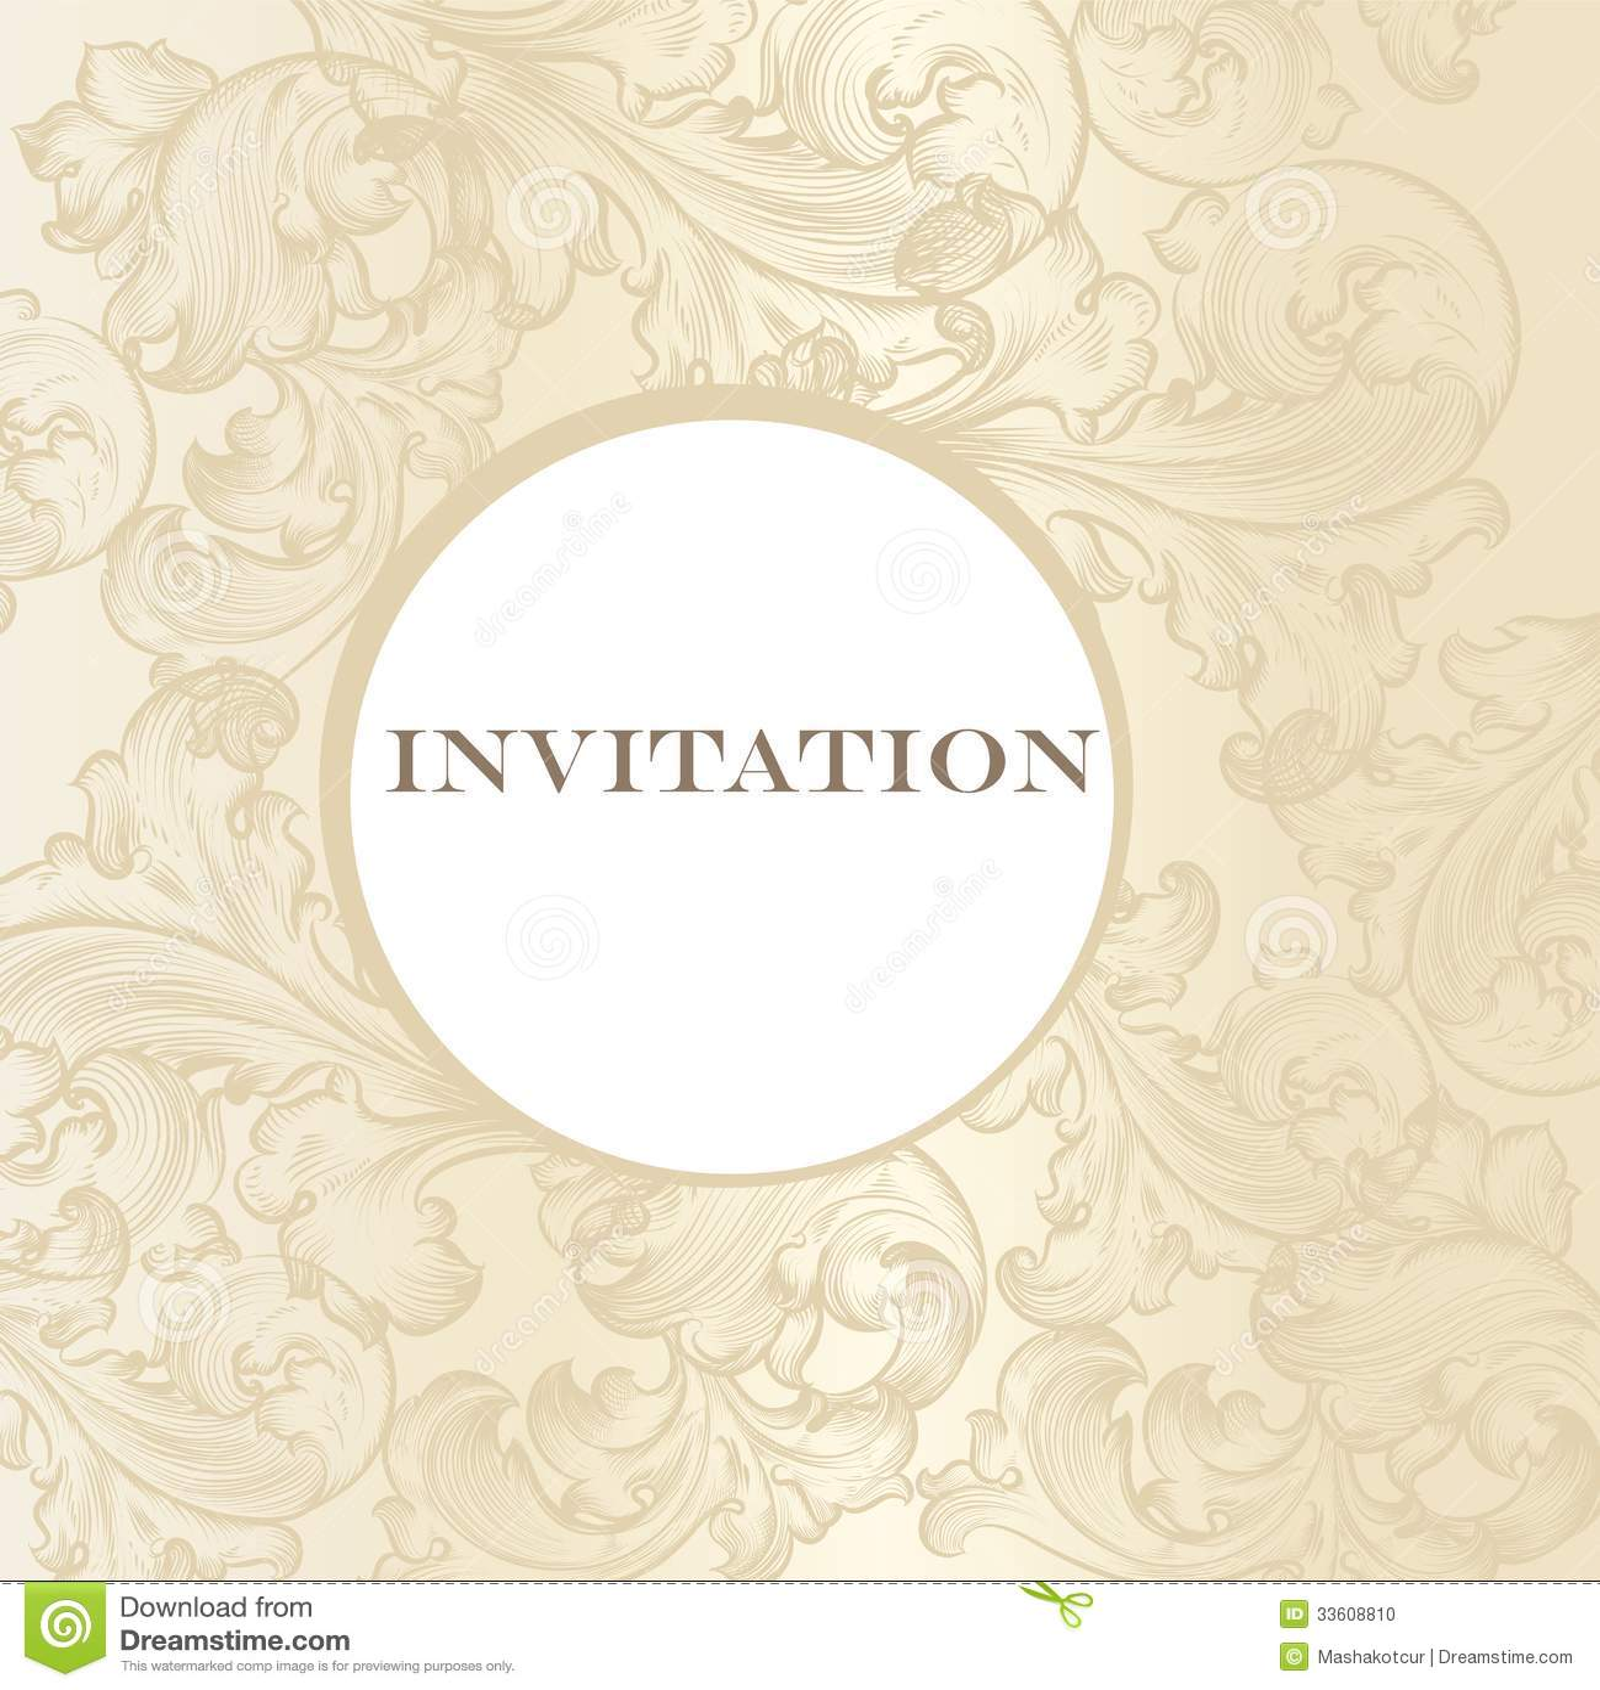 Elegant Wedding Invitation Card For Design Stock Photo - Image: 33608810